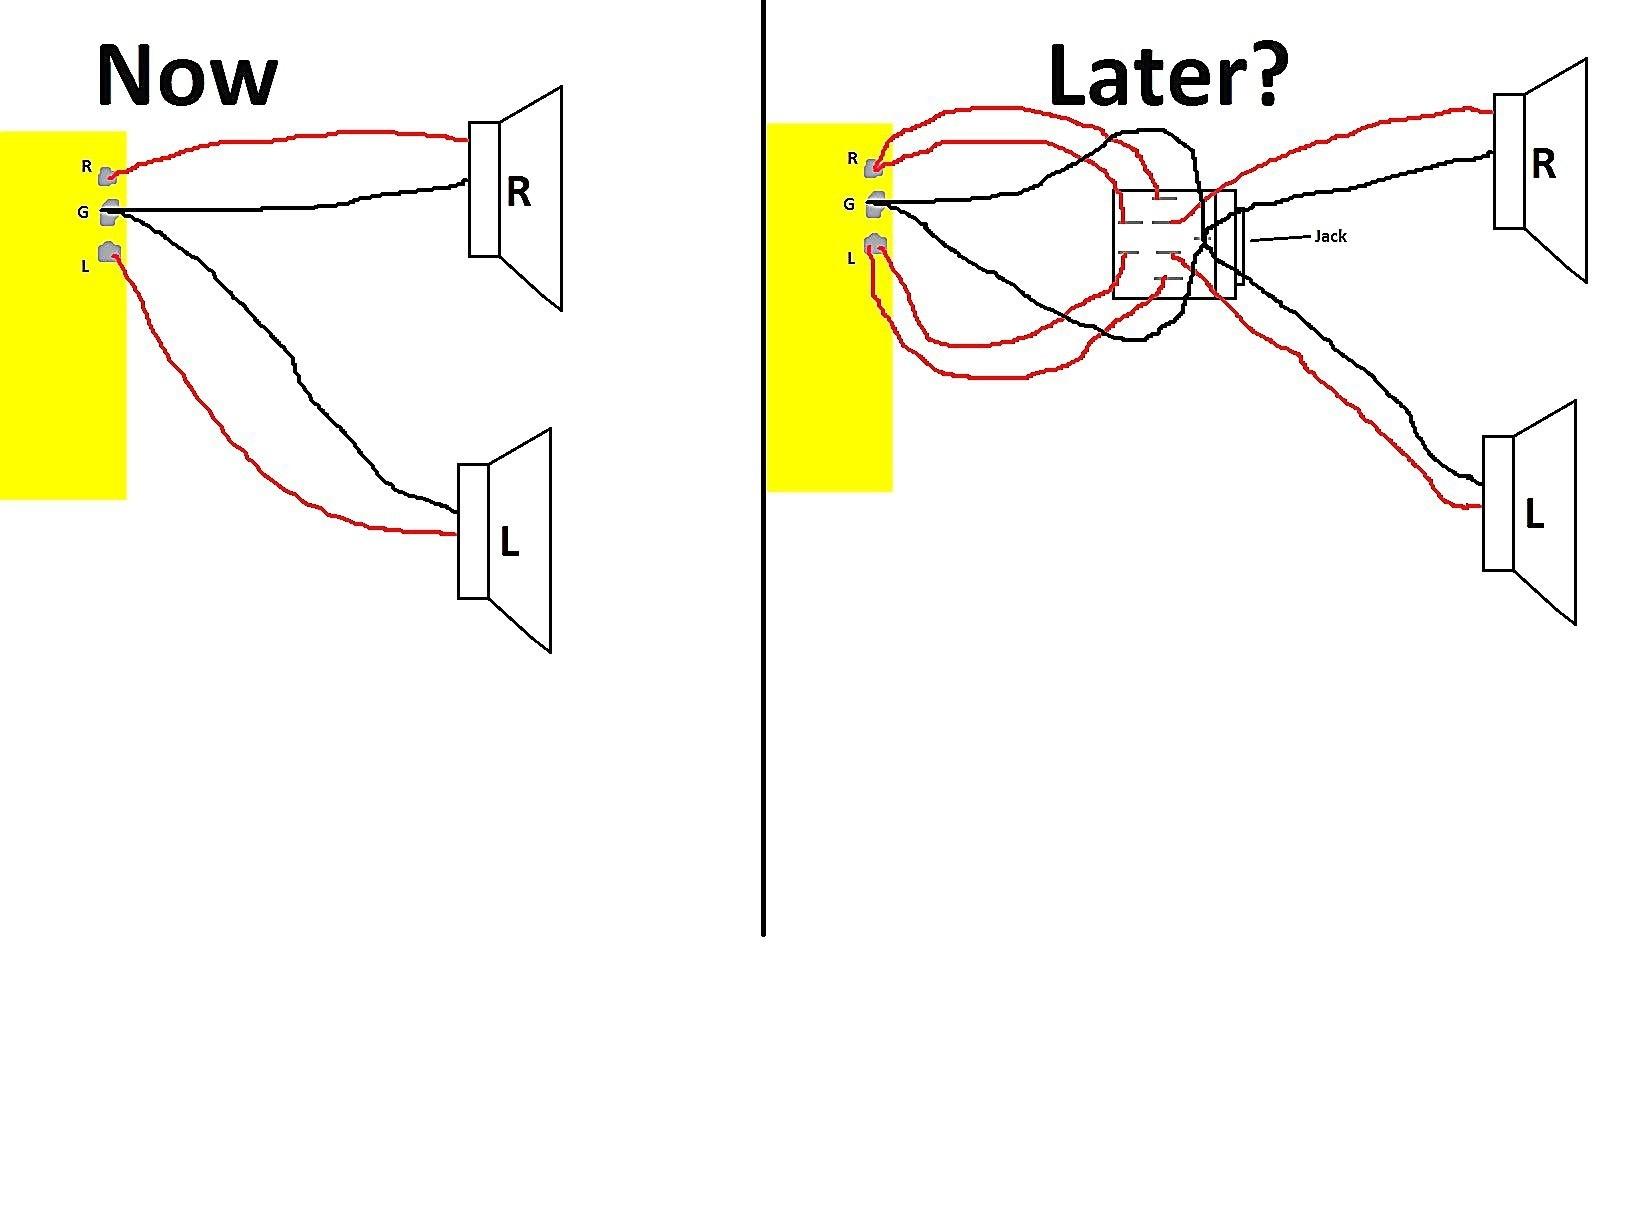 Headphone Jack Wiring Diagram Inspirational Luxury Headphone Wiring Diagram Wiring